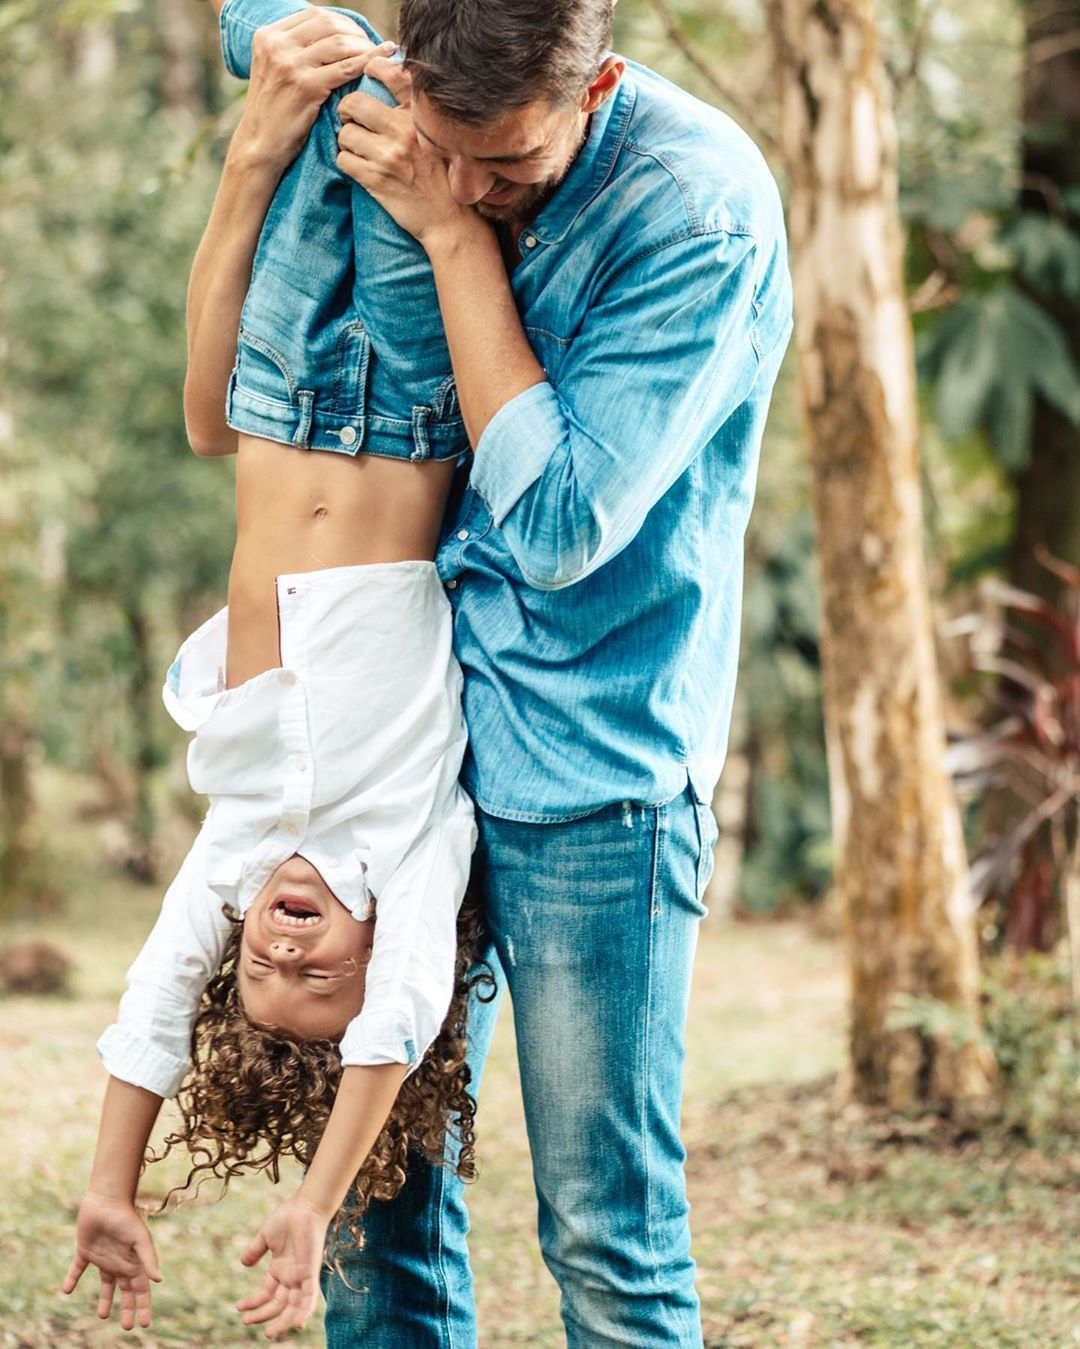 "Ana e Marille Vanin on Instagram: ""Mariana , Chris e Joaquim 💙💙💙 #Family #familytime #familygoals #familyphotos  #bookfamilia #fotosfamilia #fotografiadefamilia"""